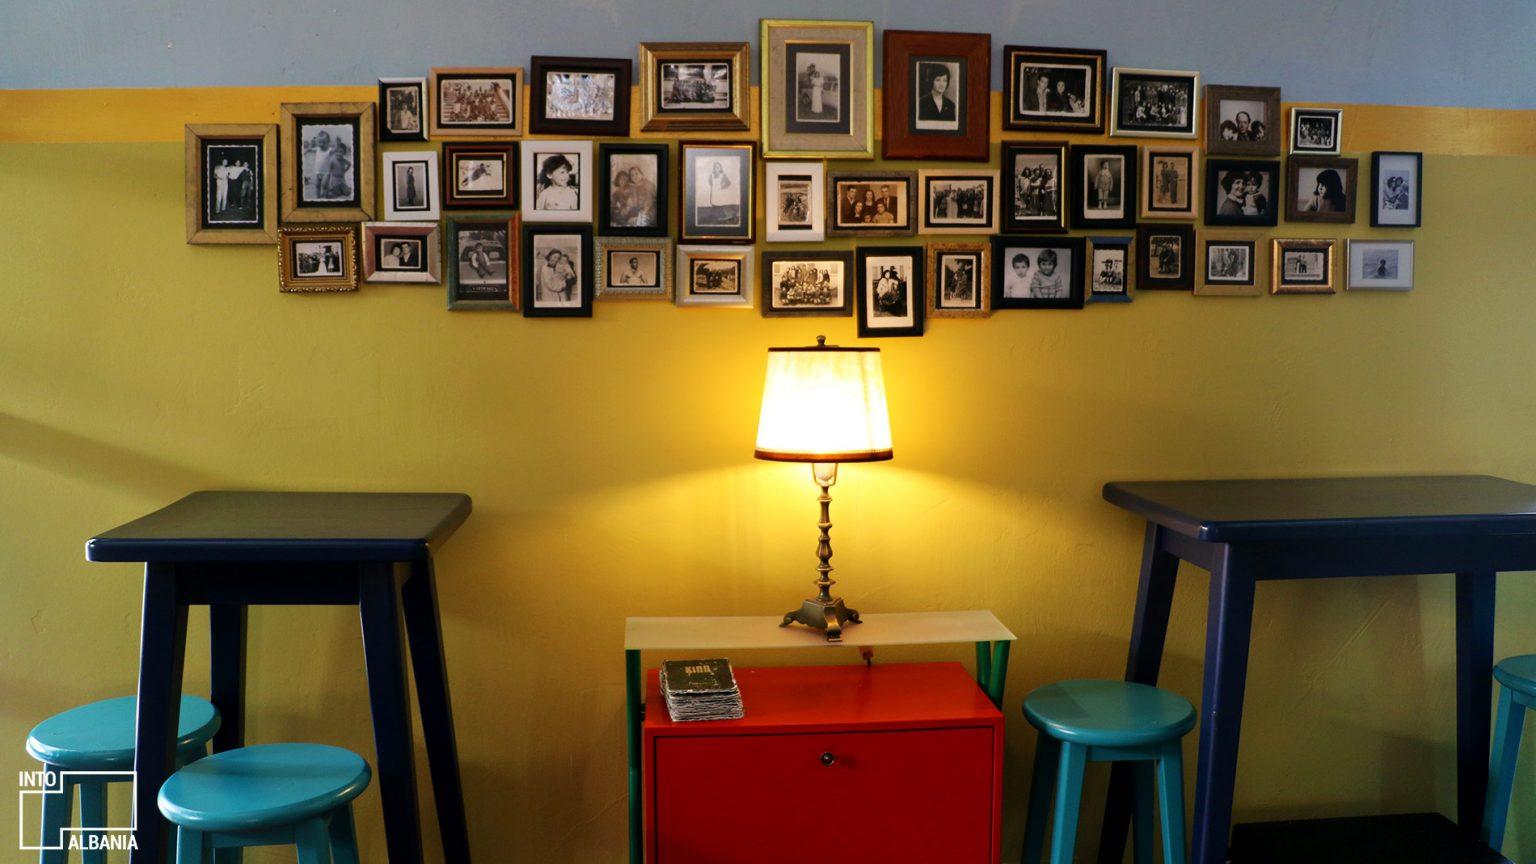 Kino bar interior, photo by IntoAlbania.